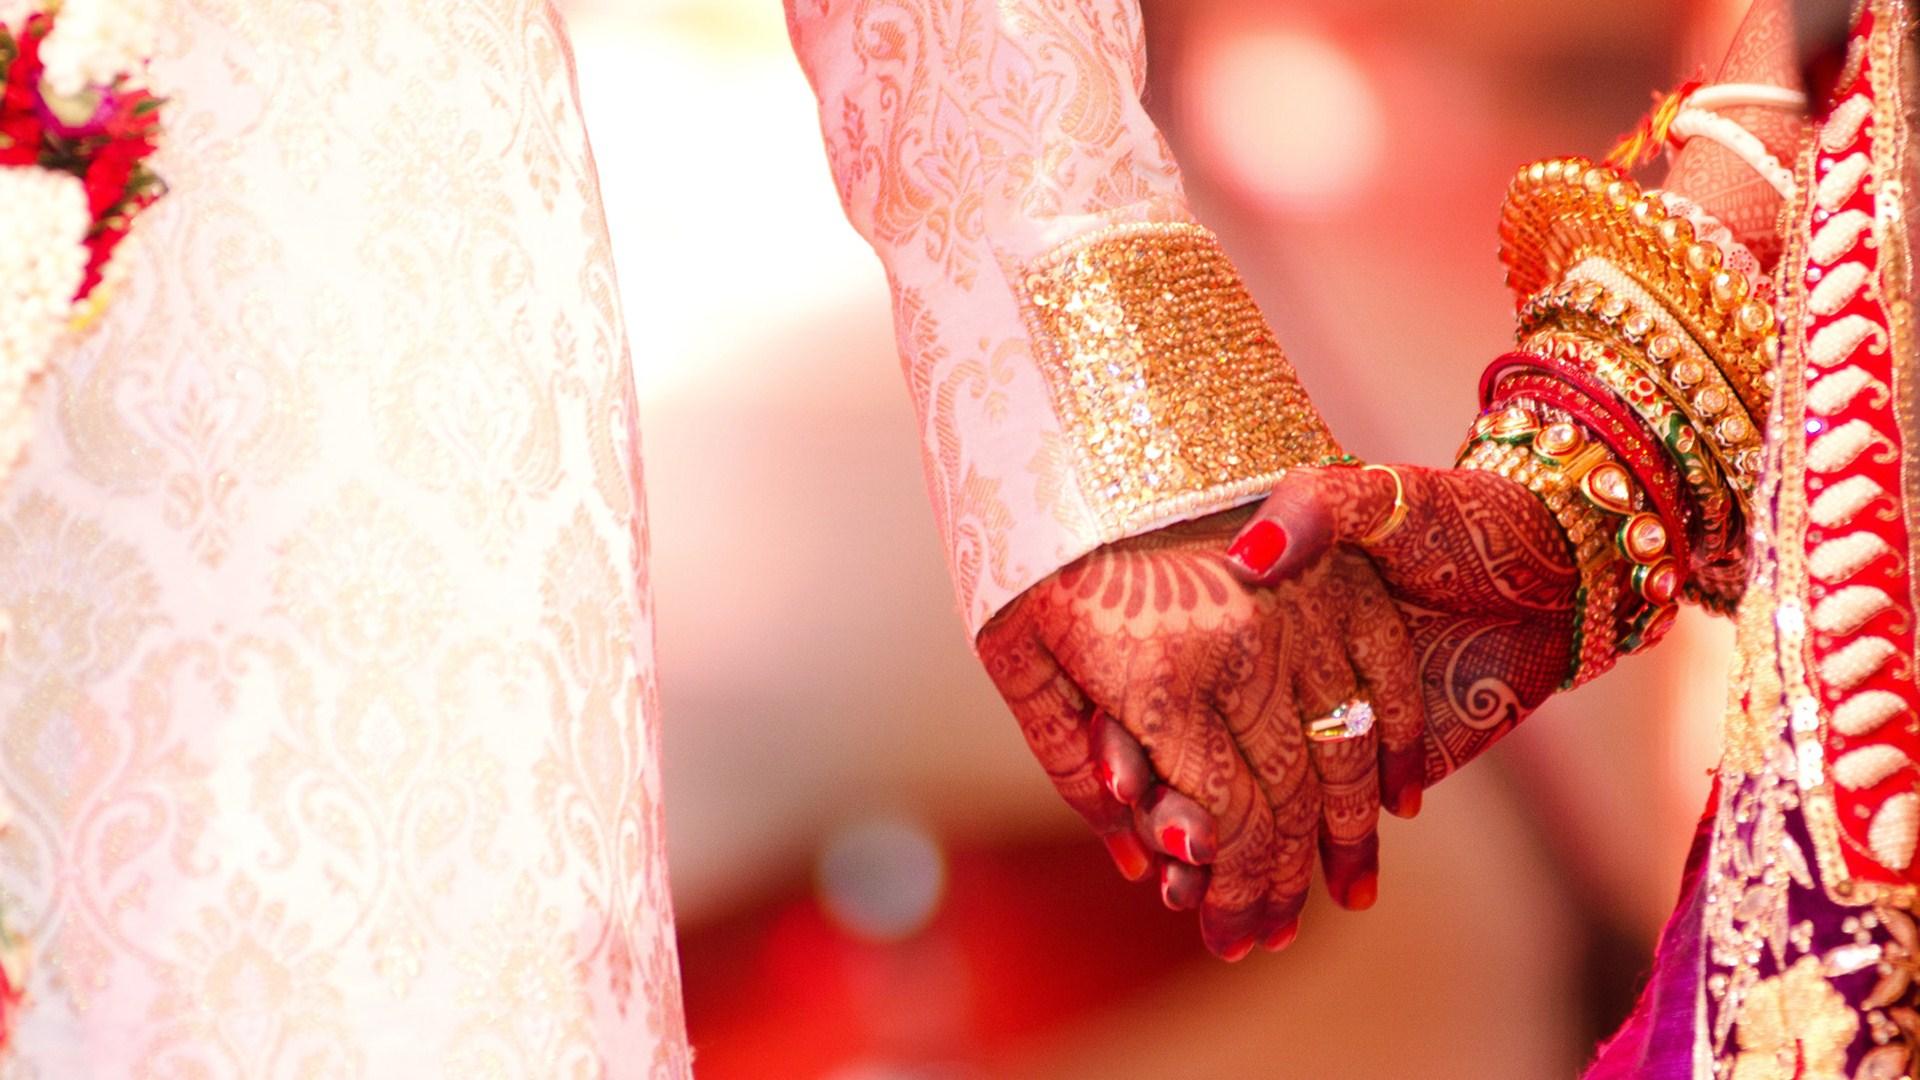 Marriage Wallpaper Bride Groom 573624 Hd Wallpaper